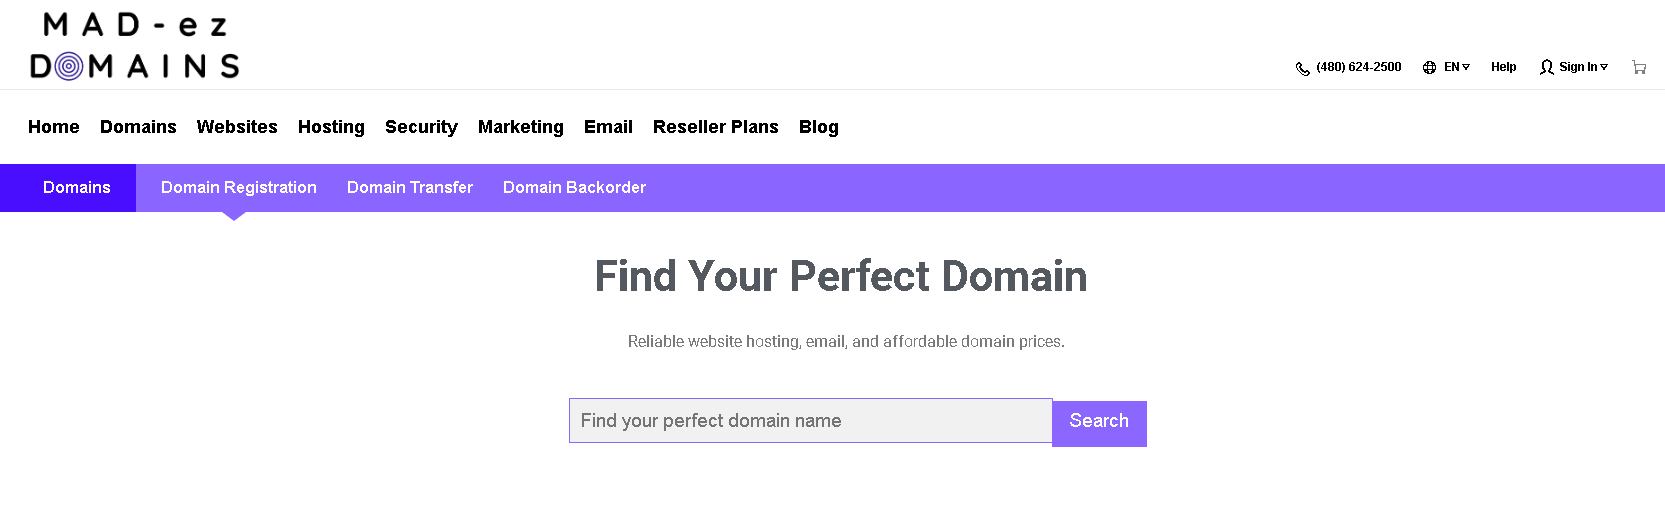 Madezdomains domain registration